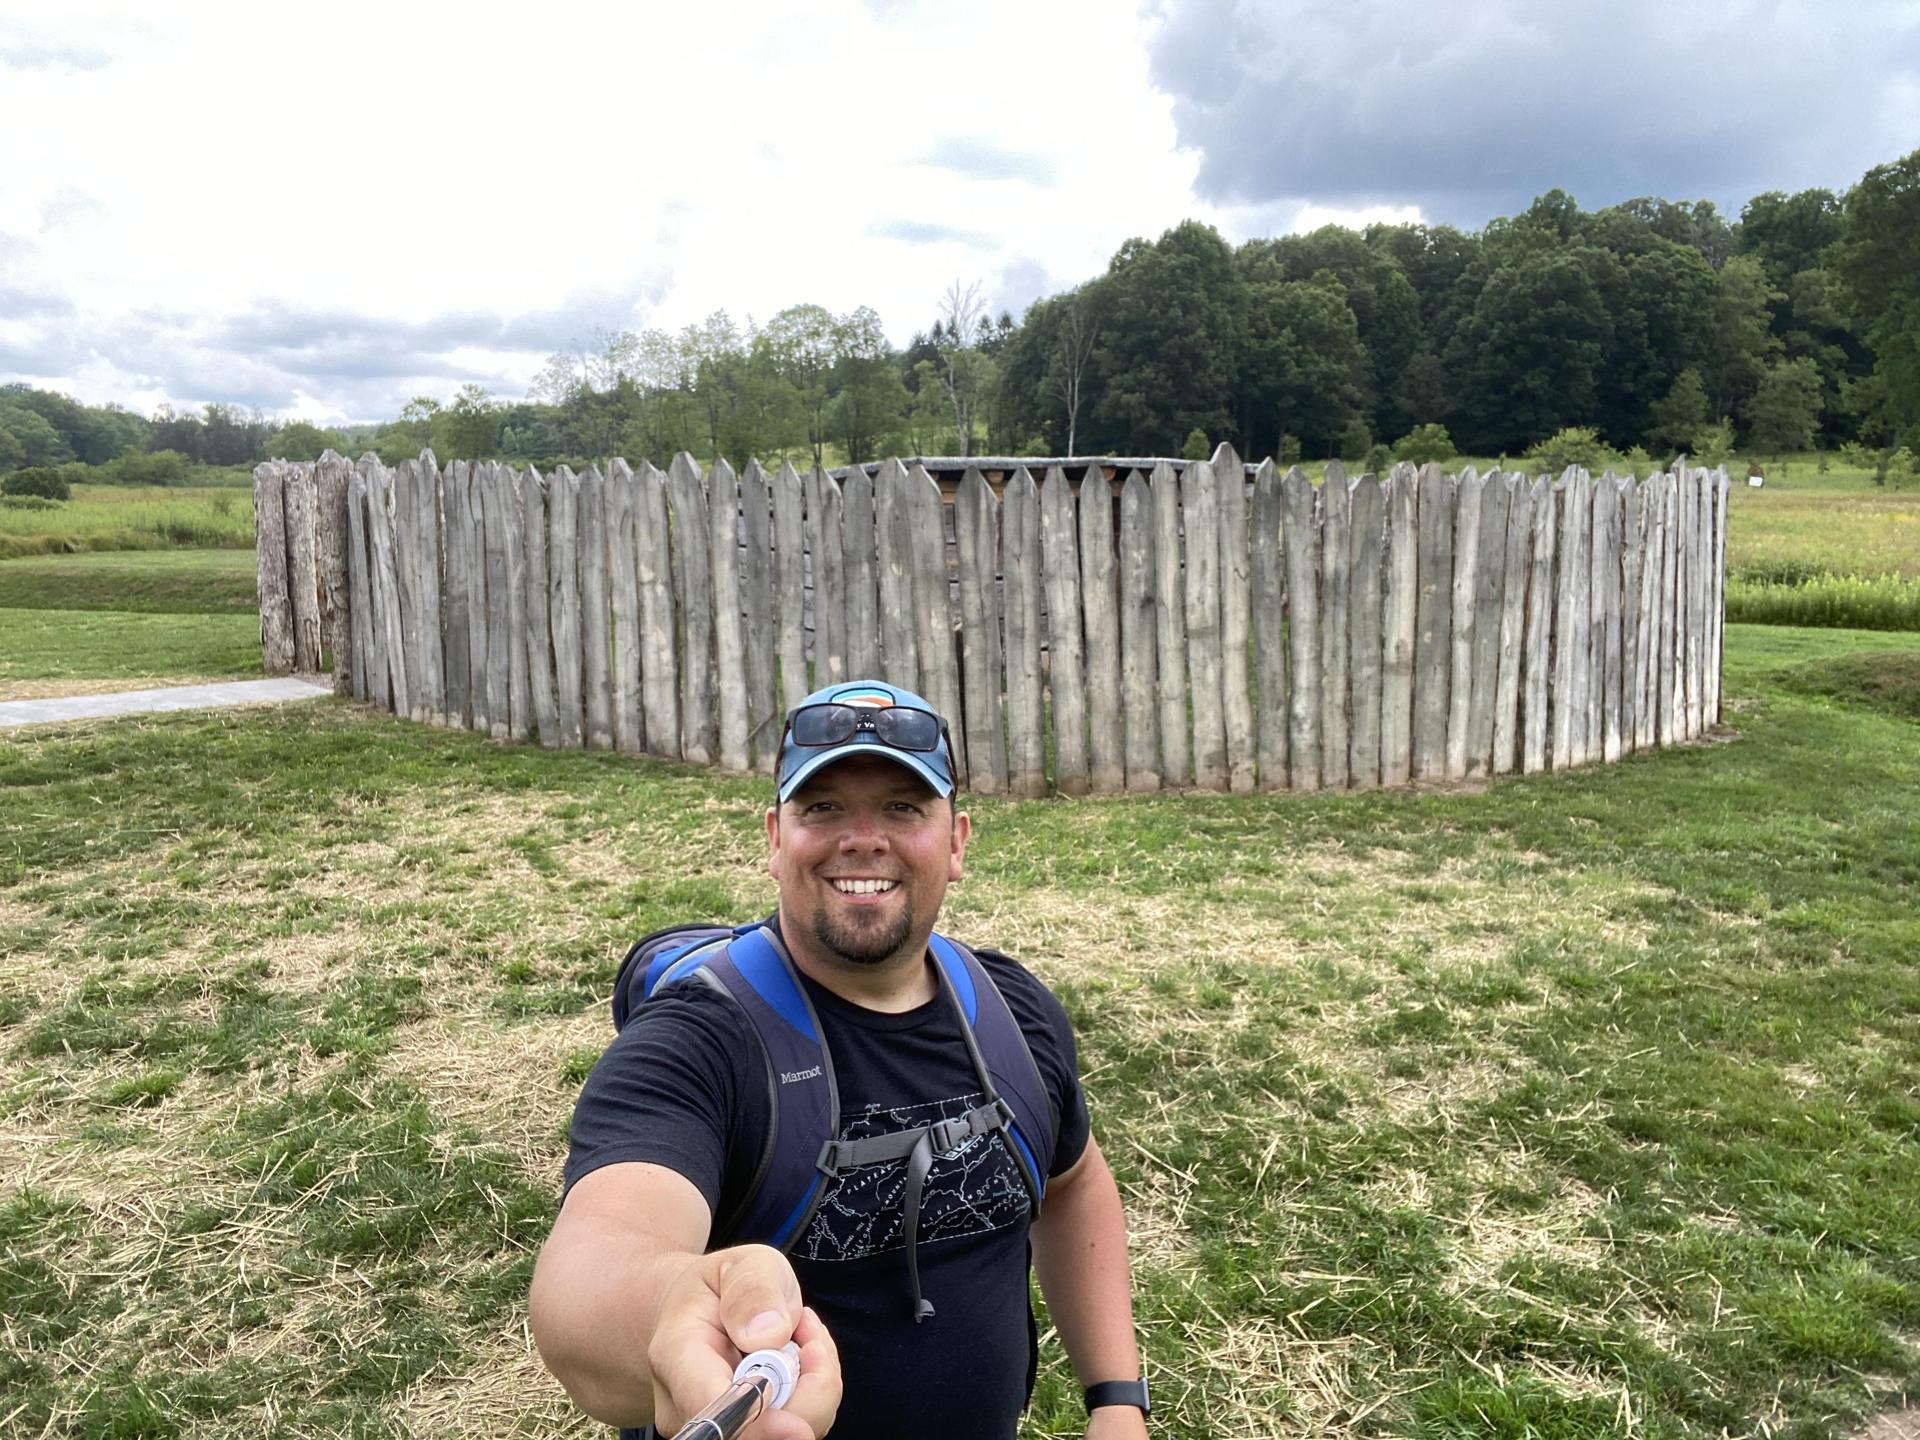 Mr. Behe visiting Fort Necessity.